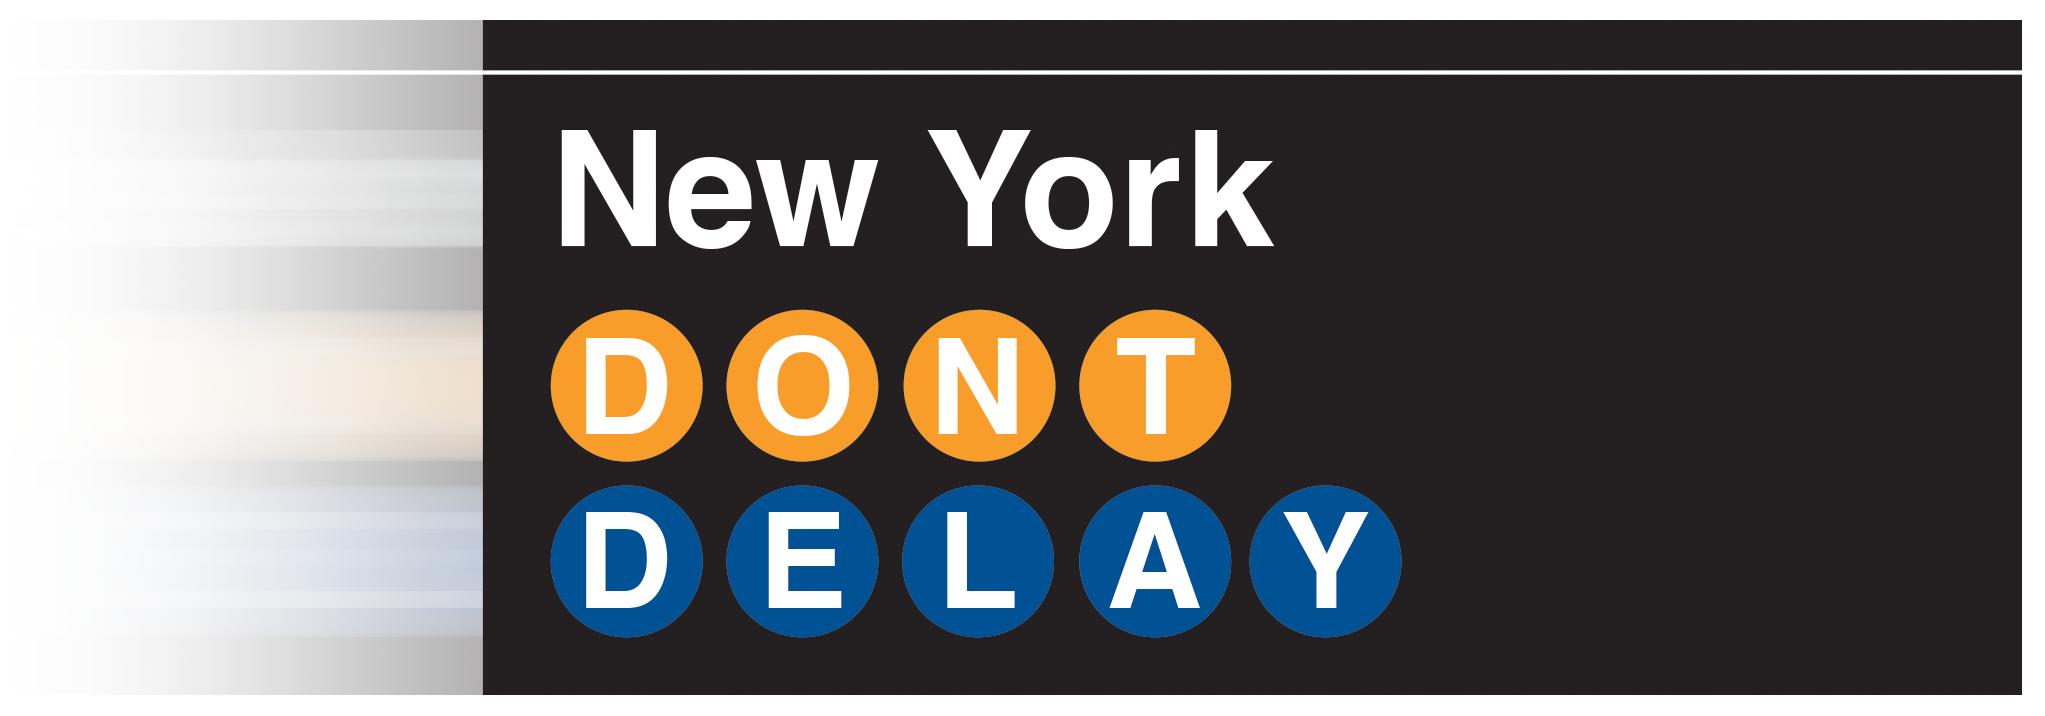 New York Metro sign saying Don't Delay